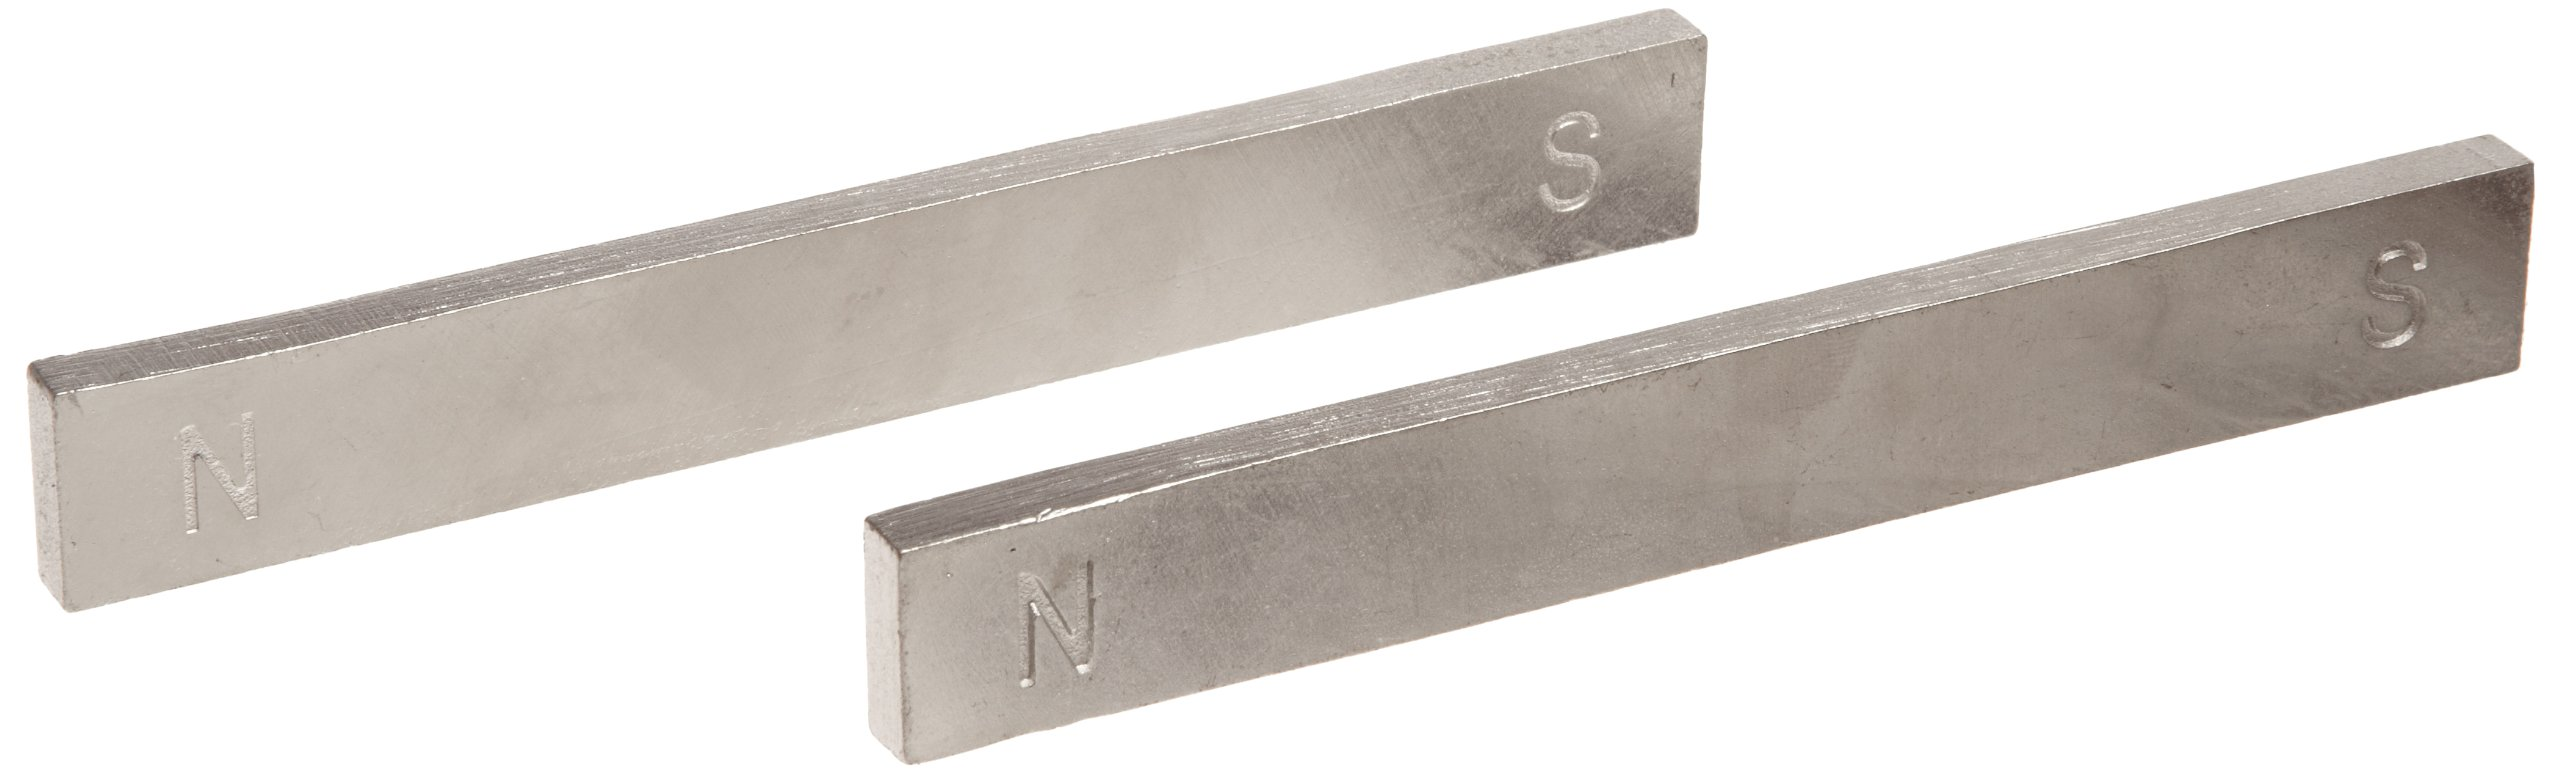 American Educational 2 Piece Unpainted Chrome Magnet Bar Set, 6'' Length